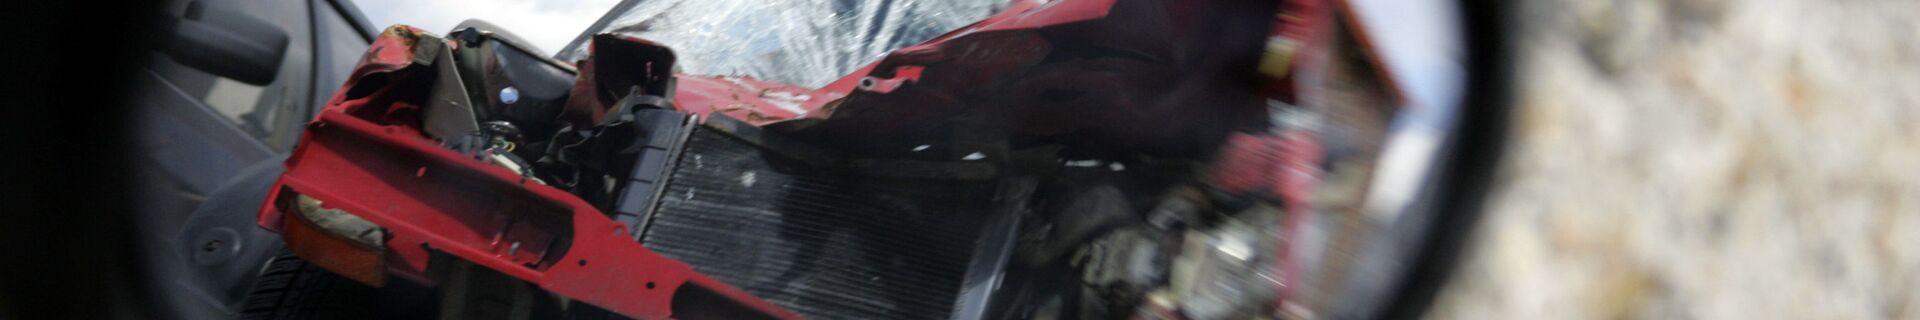 Автомобильная авария, фото из архива - Sputnik Azərbaycan